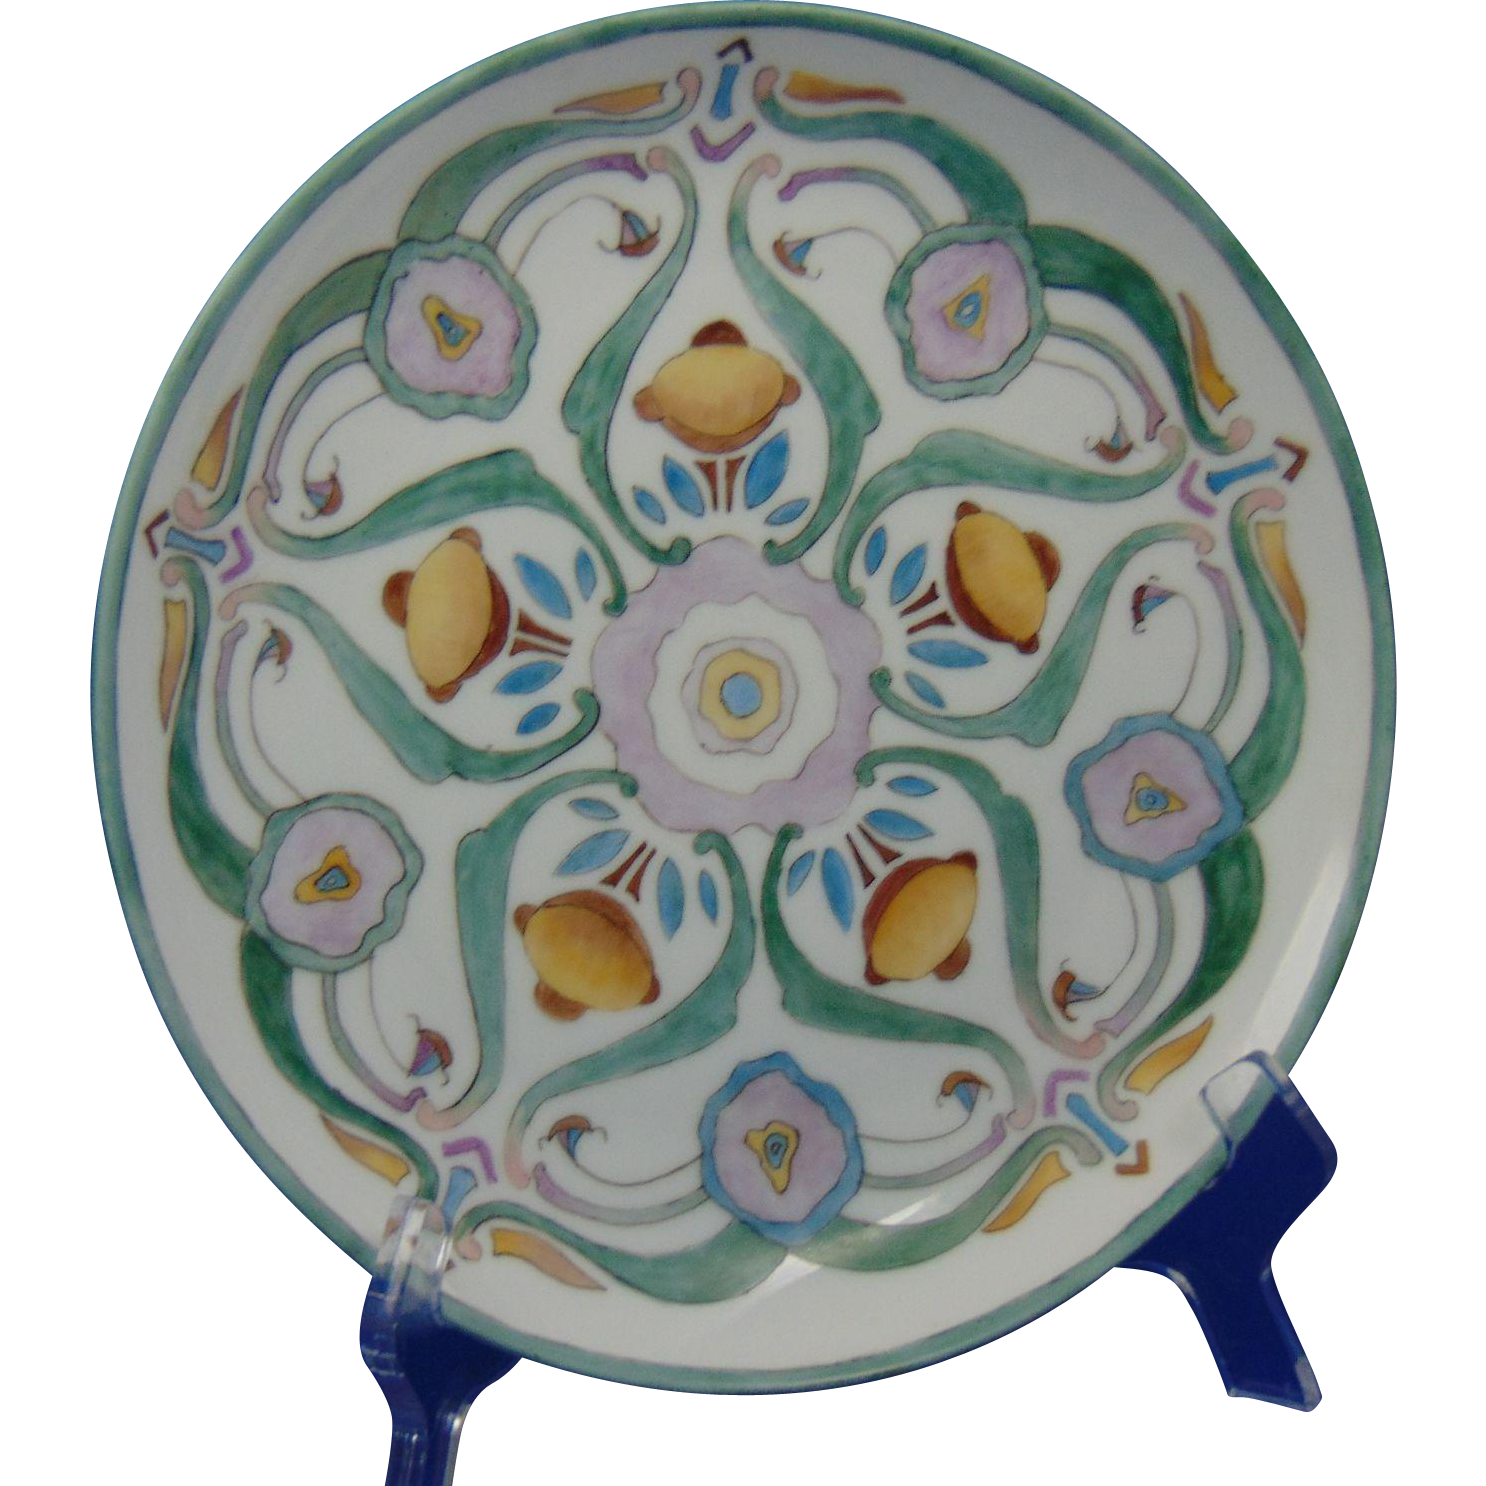 Hutschenreuther Bavaria Arts & Crafts Abstract Floral Design Plate (c.1900-1920) - Keramic Studio Design